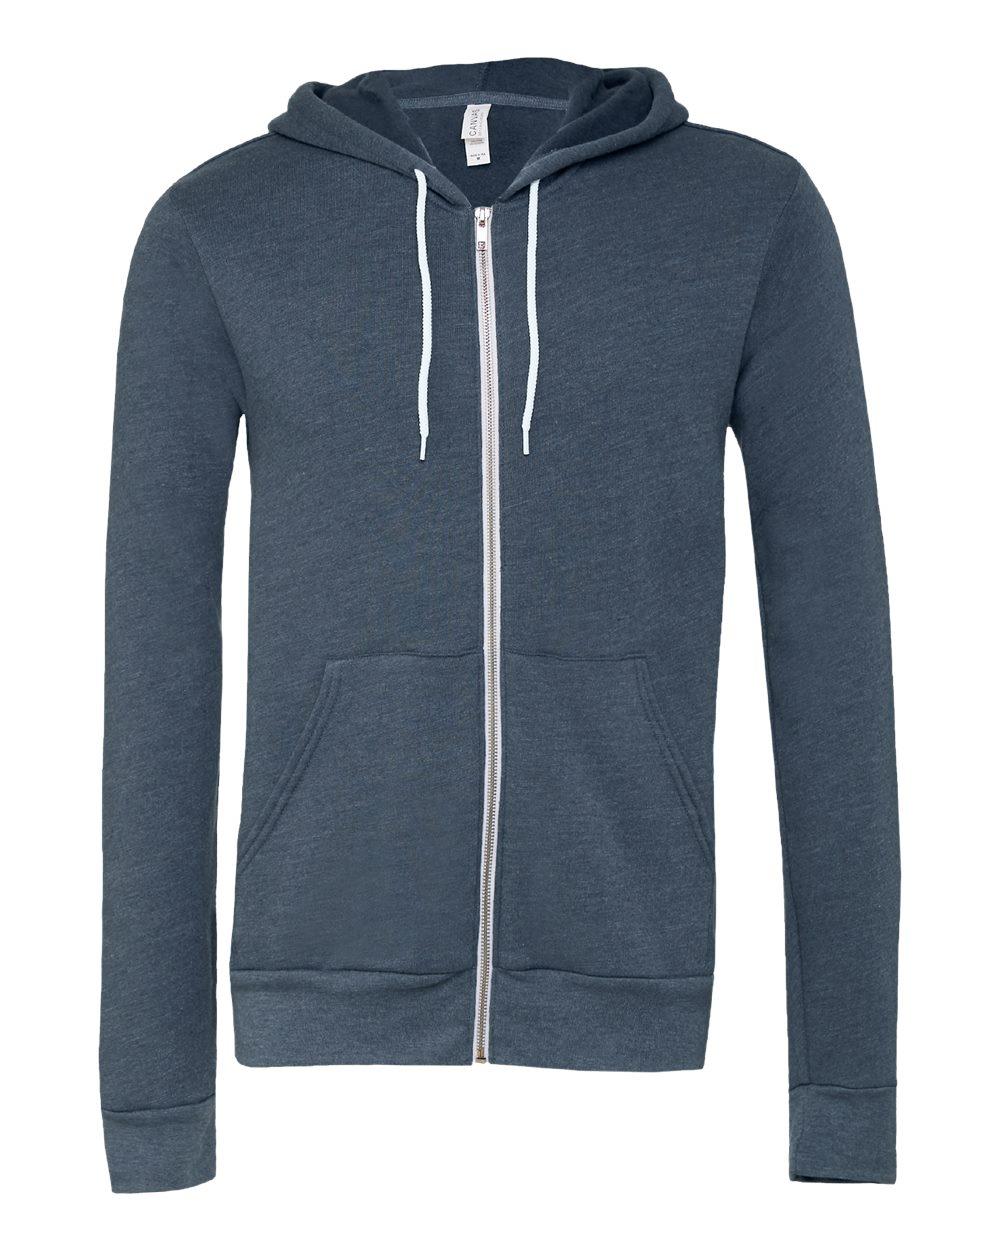 Bella-Canvas-Unisex-Full-Zip-Up-Hooded-Sweatshirt-Blank-Hoodie-3739-up-to-3XL thumbnail 46